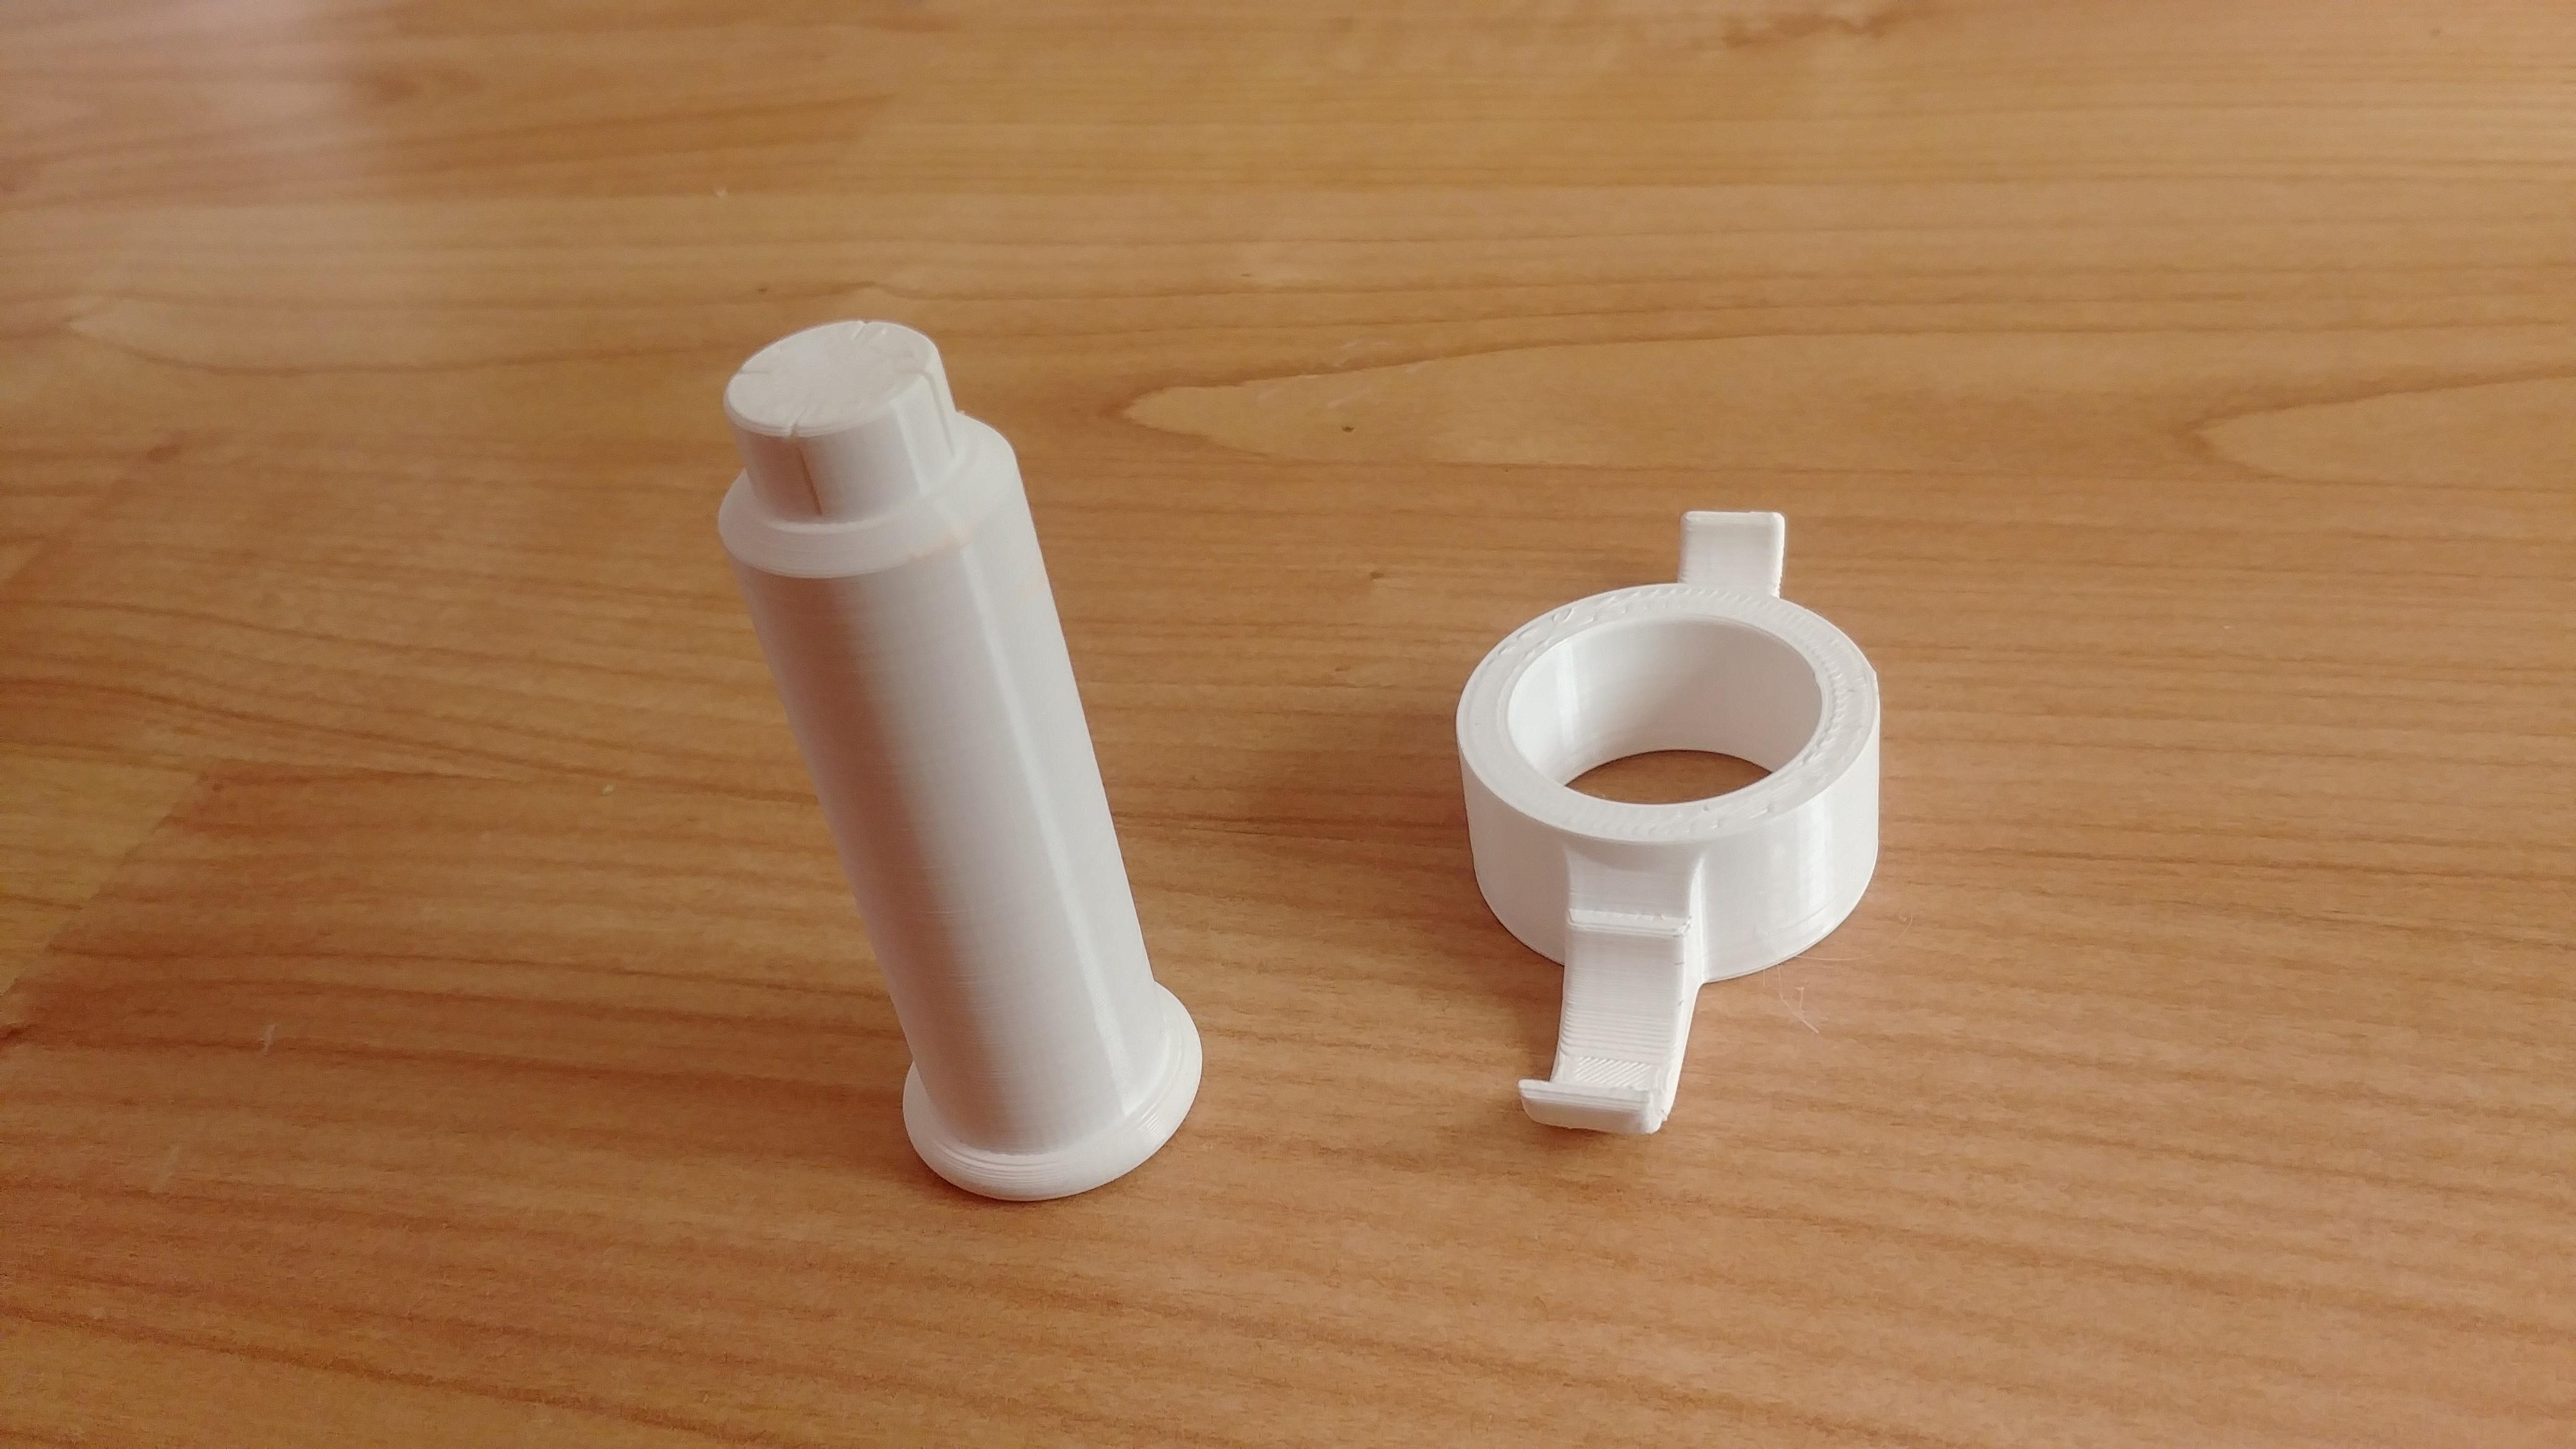 20180402_141039.jpg Download free STL file Play-Doh Doh Vinci Extruder • Design to 3D print, Marcin_Wojcik